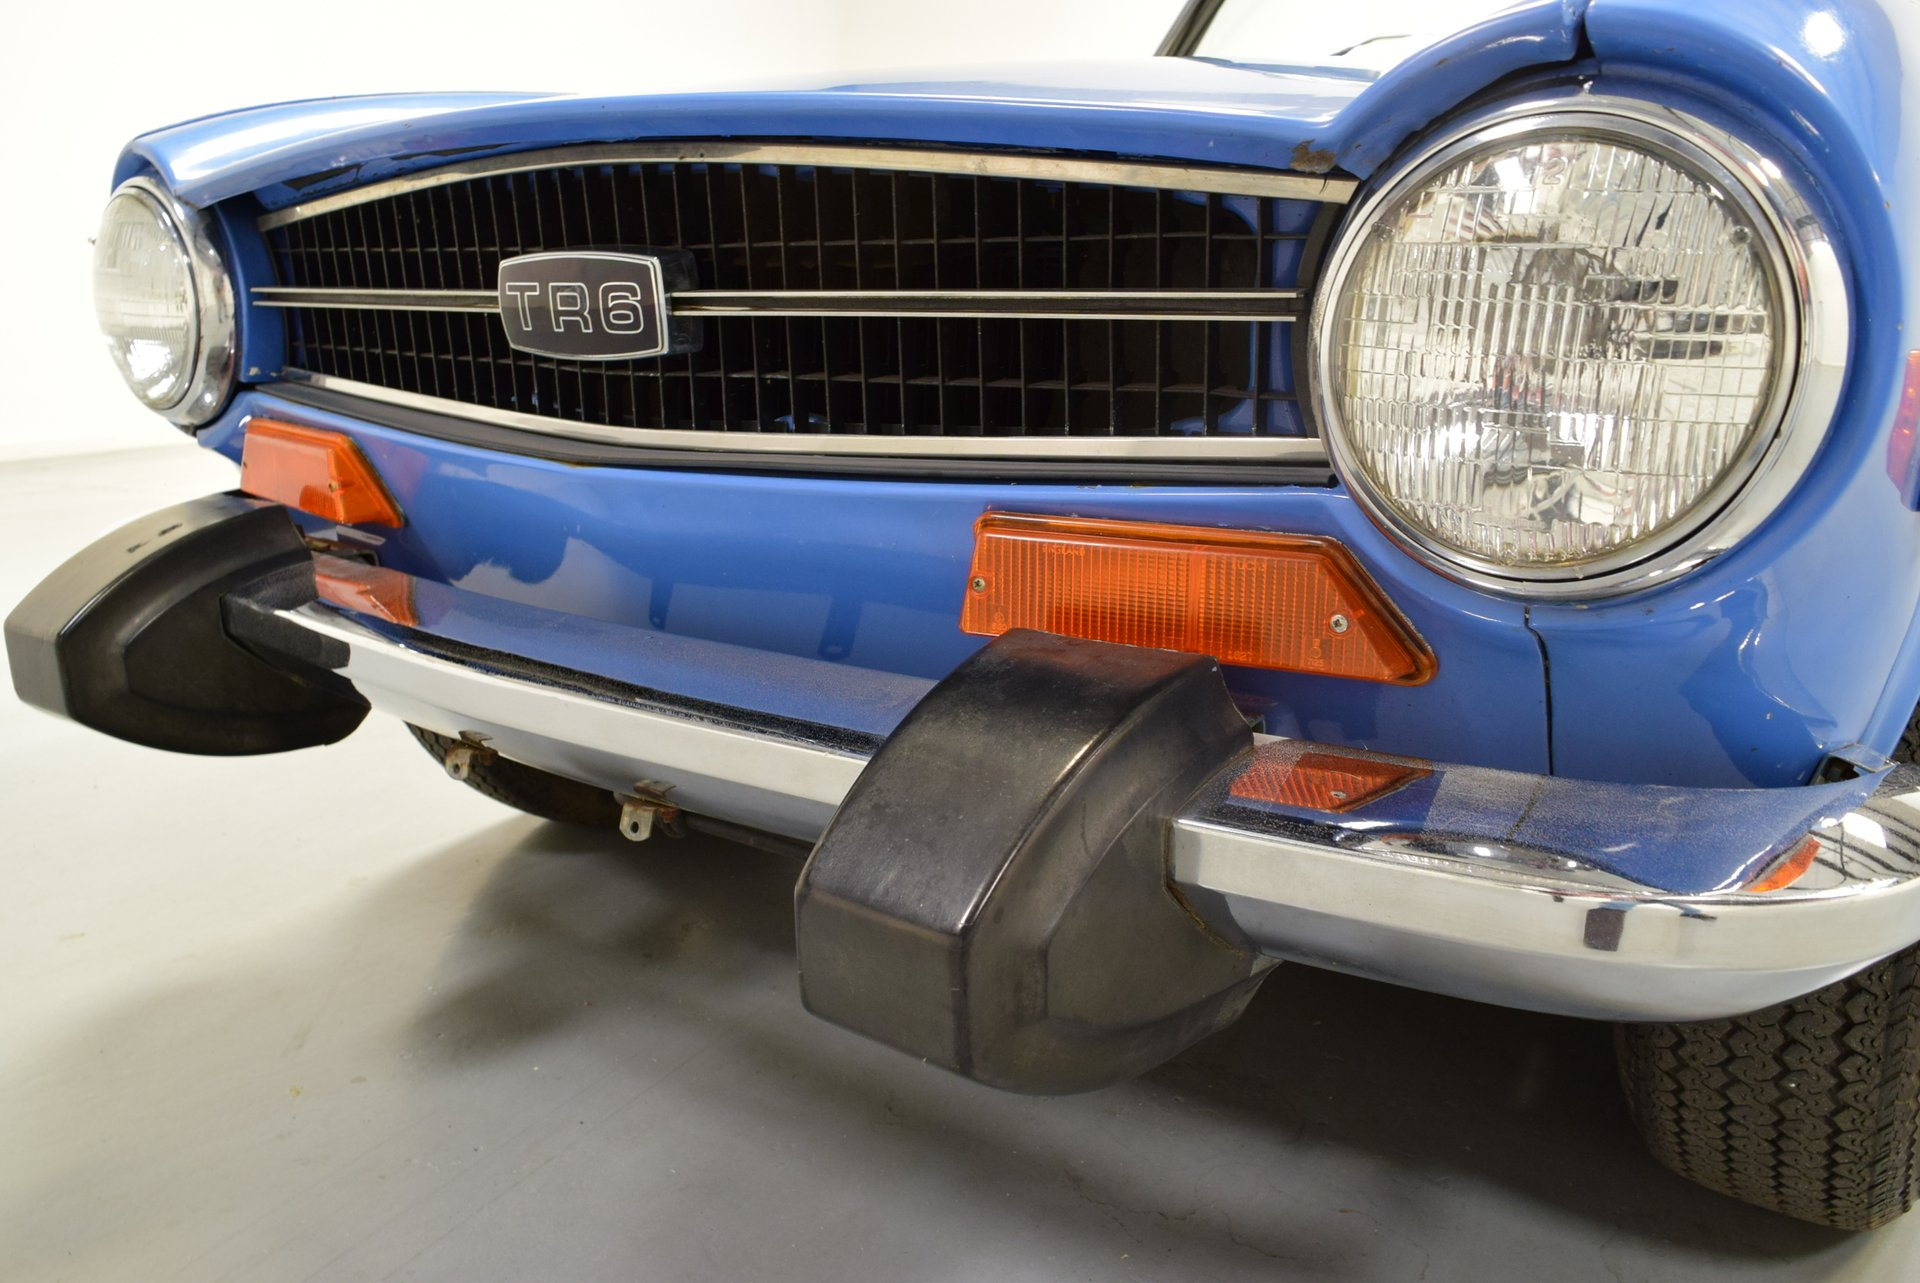 1974 Triumph TR6 | Shelton Classics & Performance